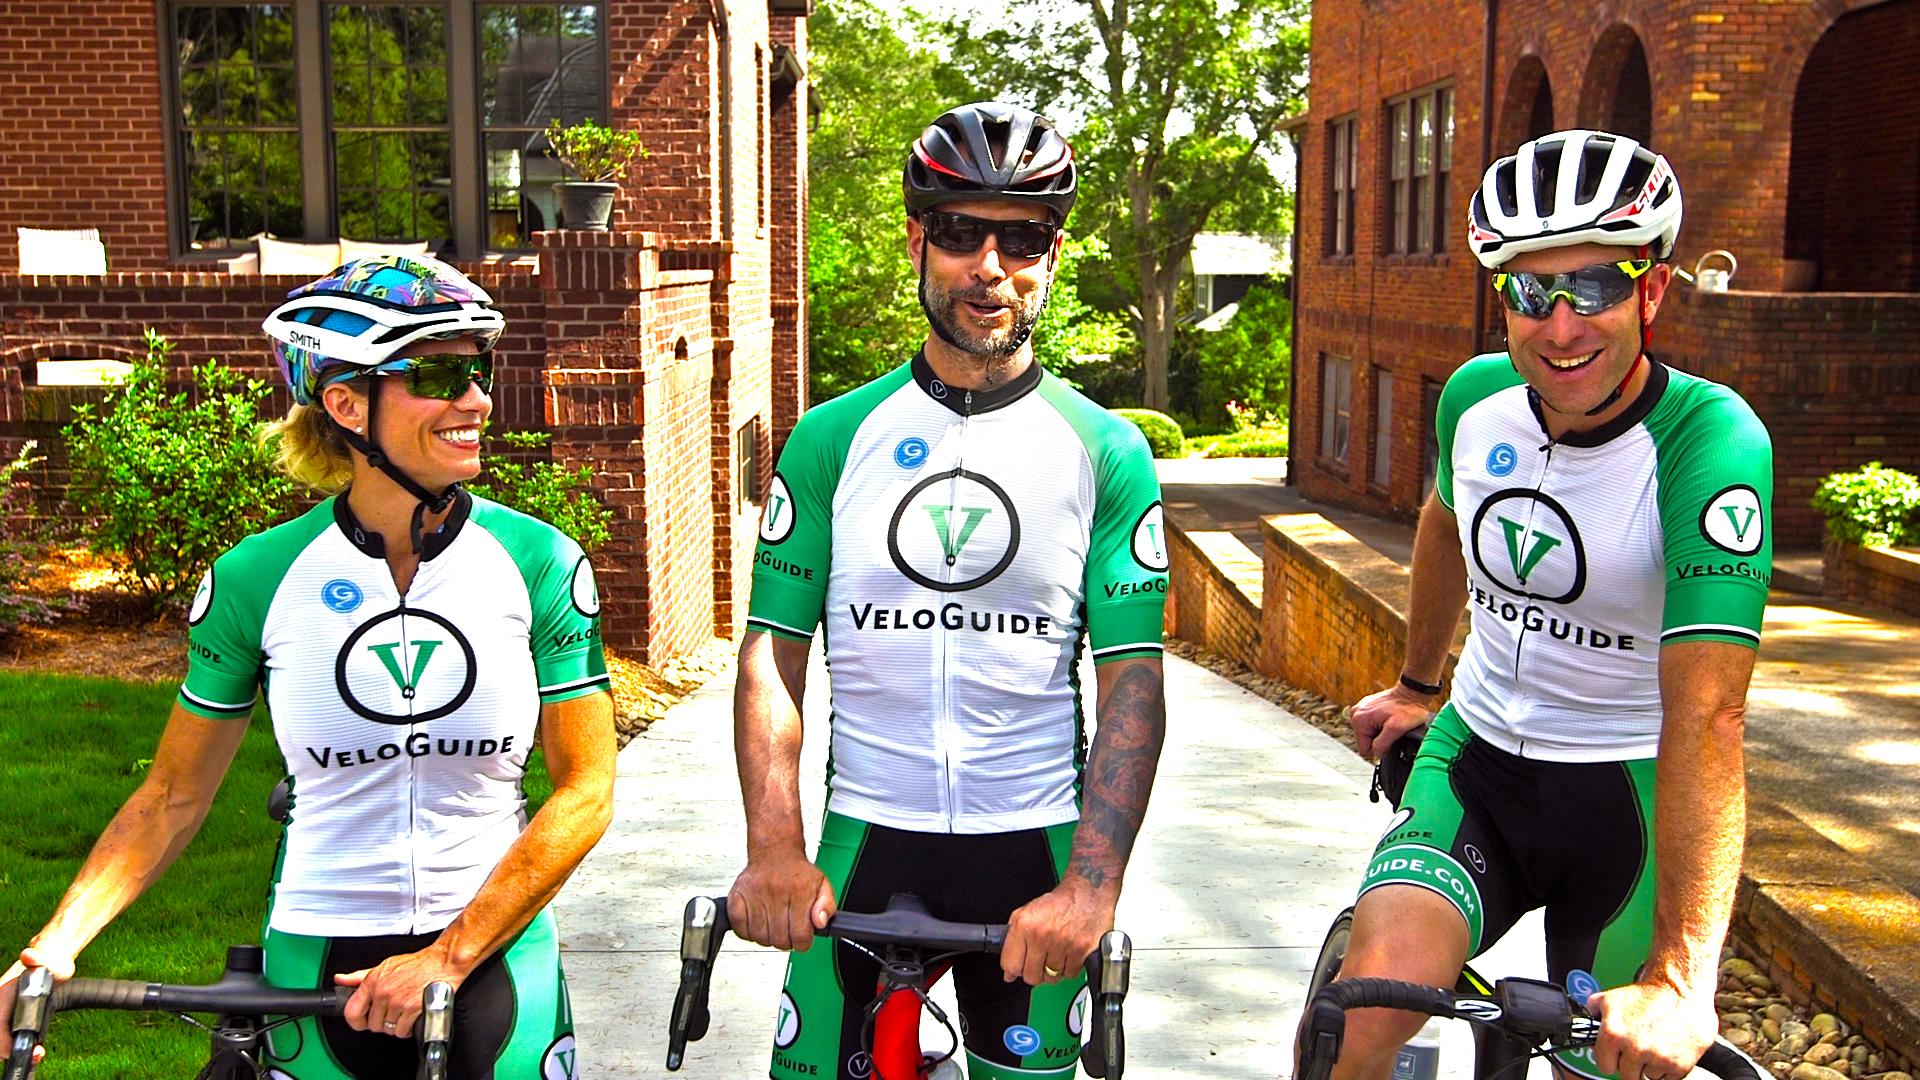 Global Bike Tours | VeloGuide